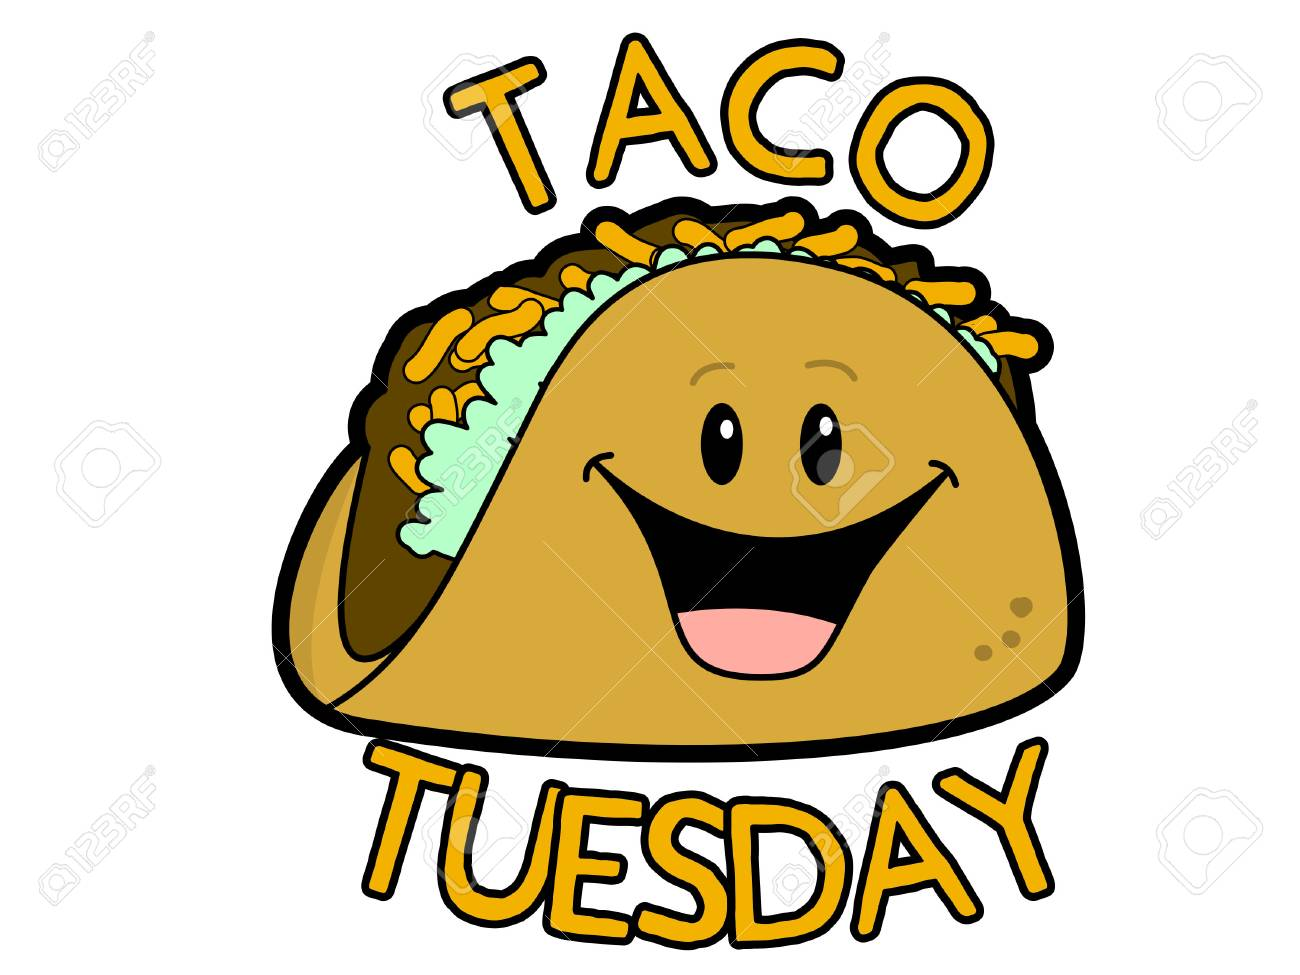 Taco Tuesday Cartoon Sign vector illustration - 96609345